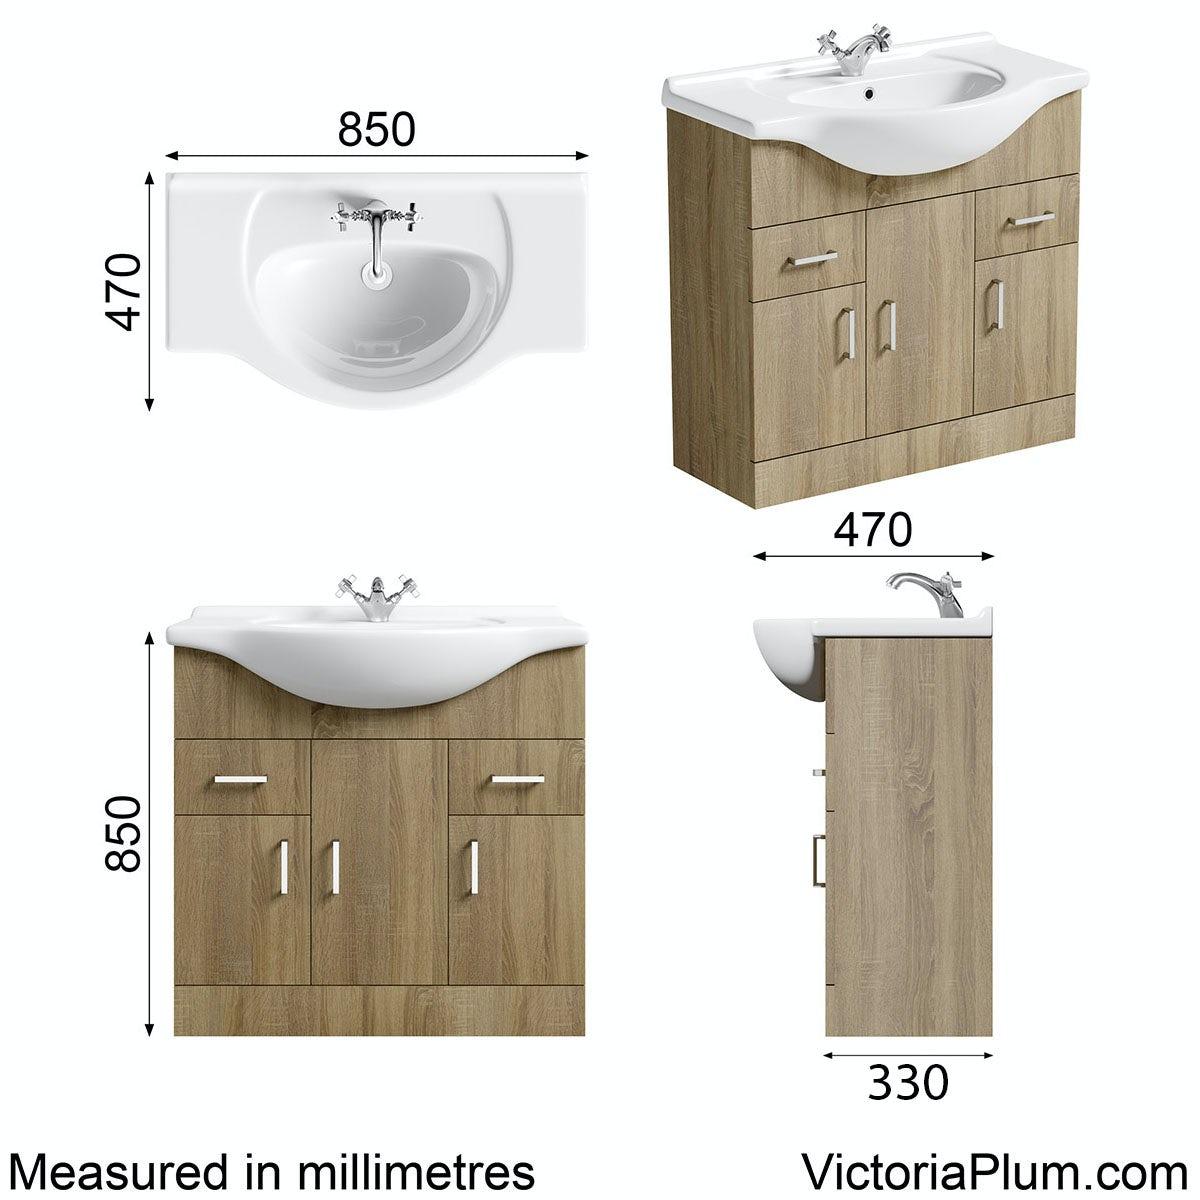 Dimensions for Orchard Eden oak vanity unit and basin 850mm